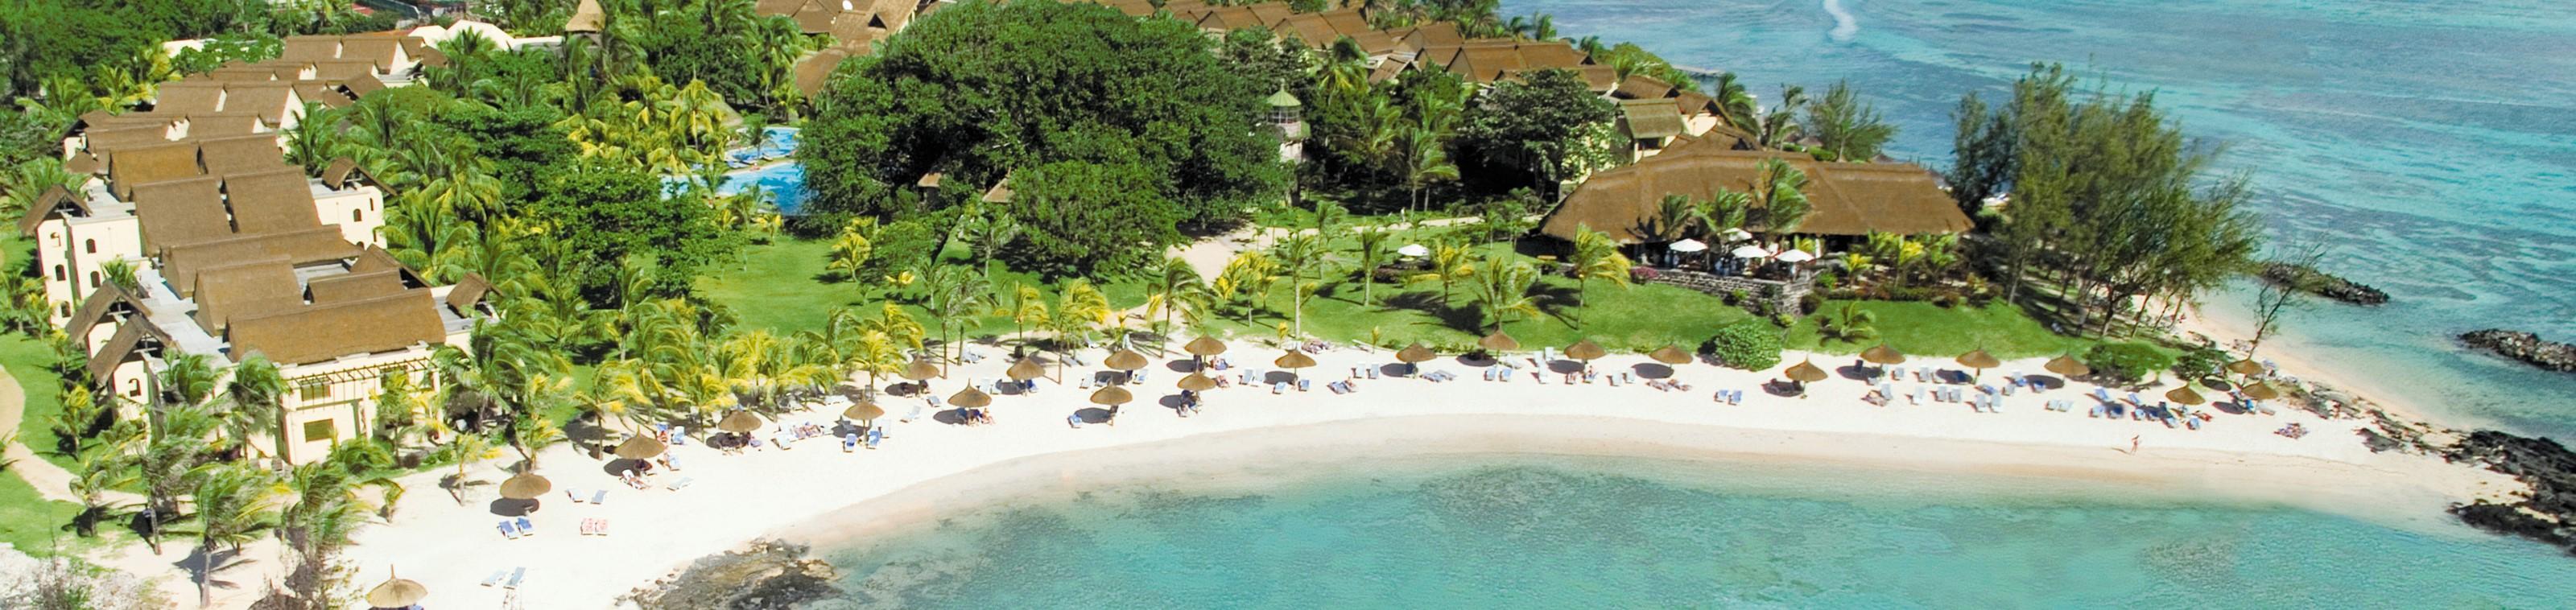 Canonnier Beachcomber Golf Resort & Spa op Mauritius